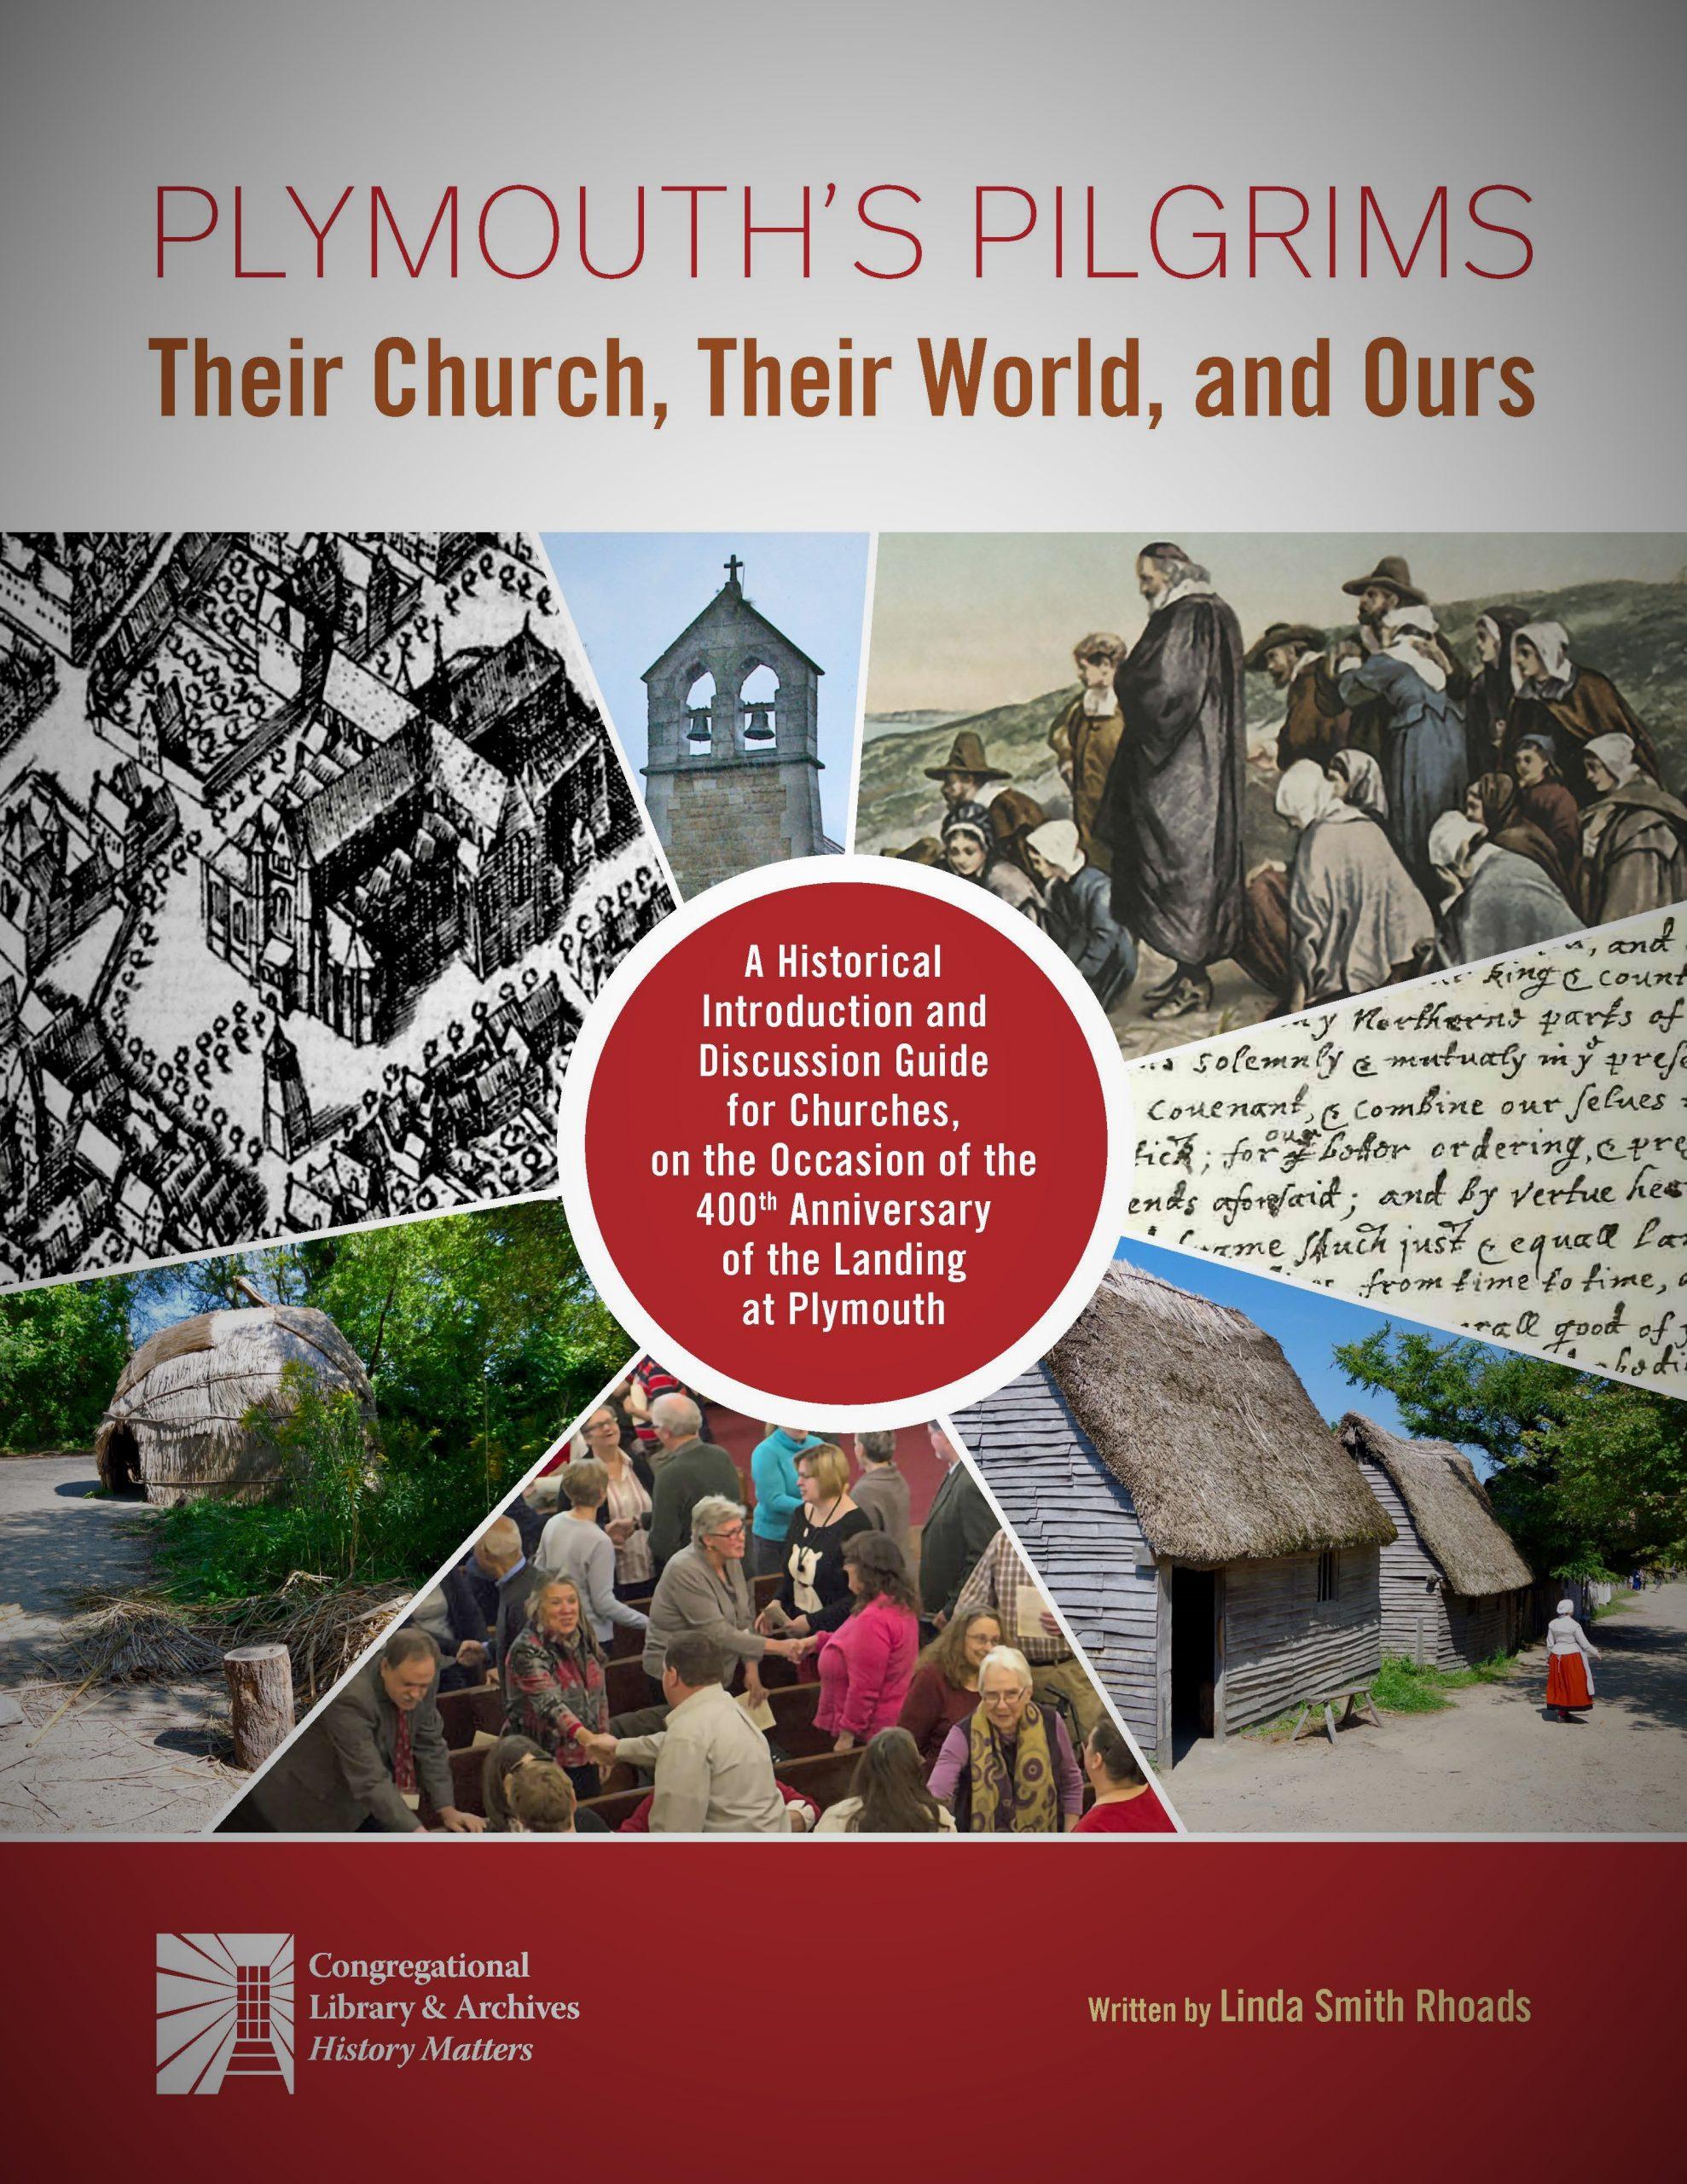 Plymouth's Pilgrims curriculum cover 2020